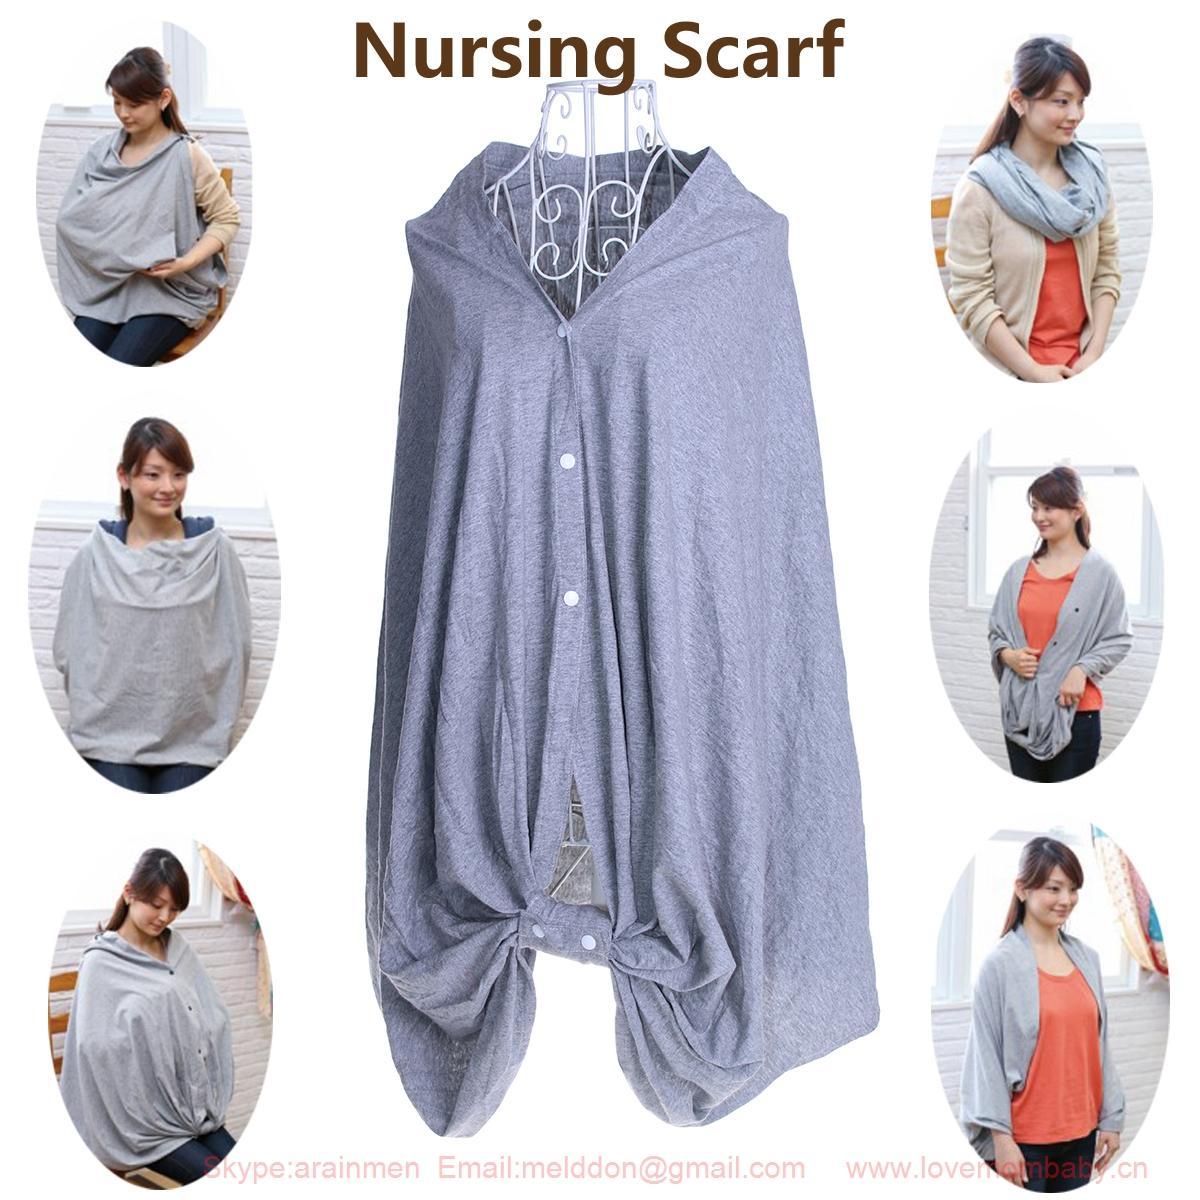 sandexica nursing scarf breast feeding cover up multifunctional